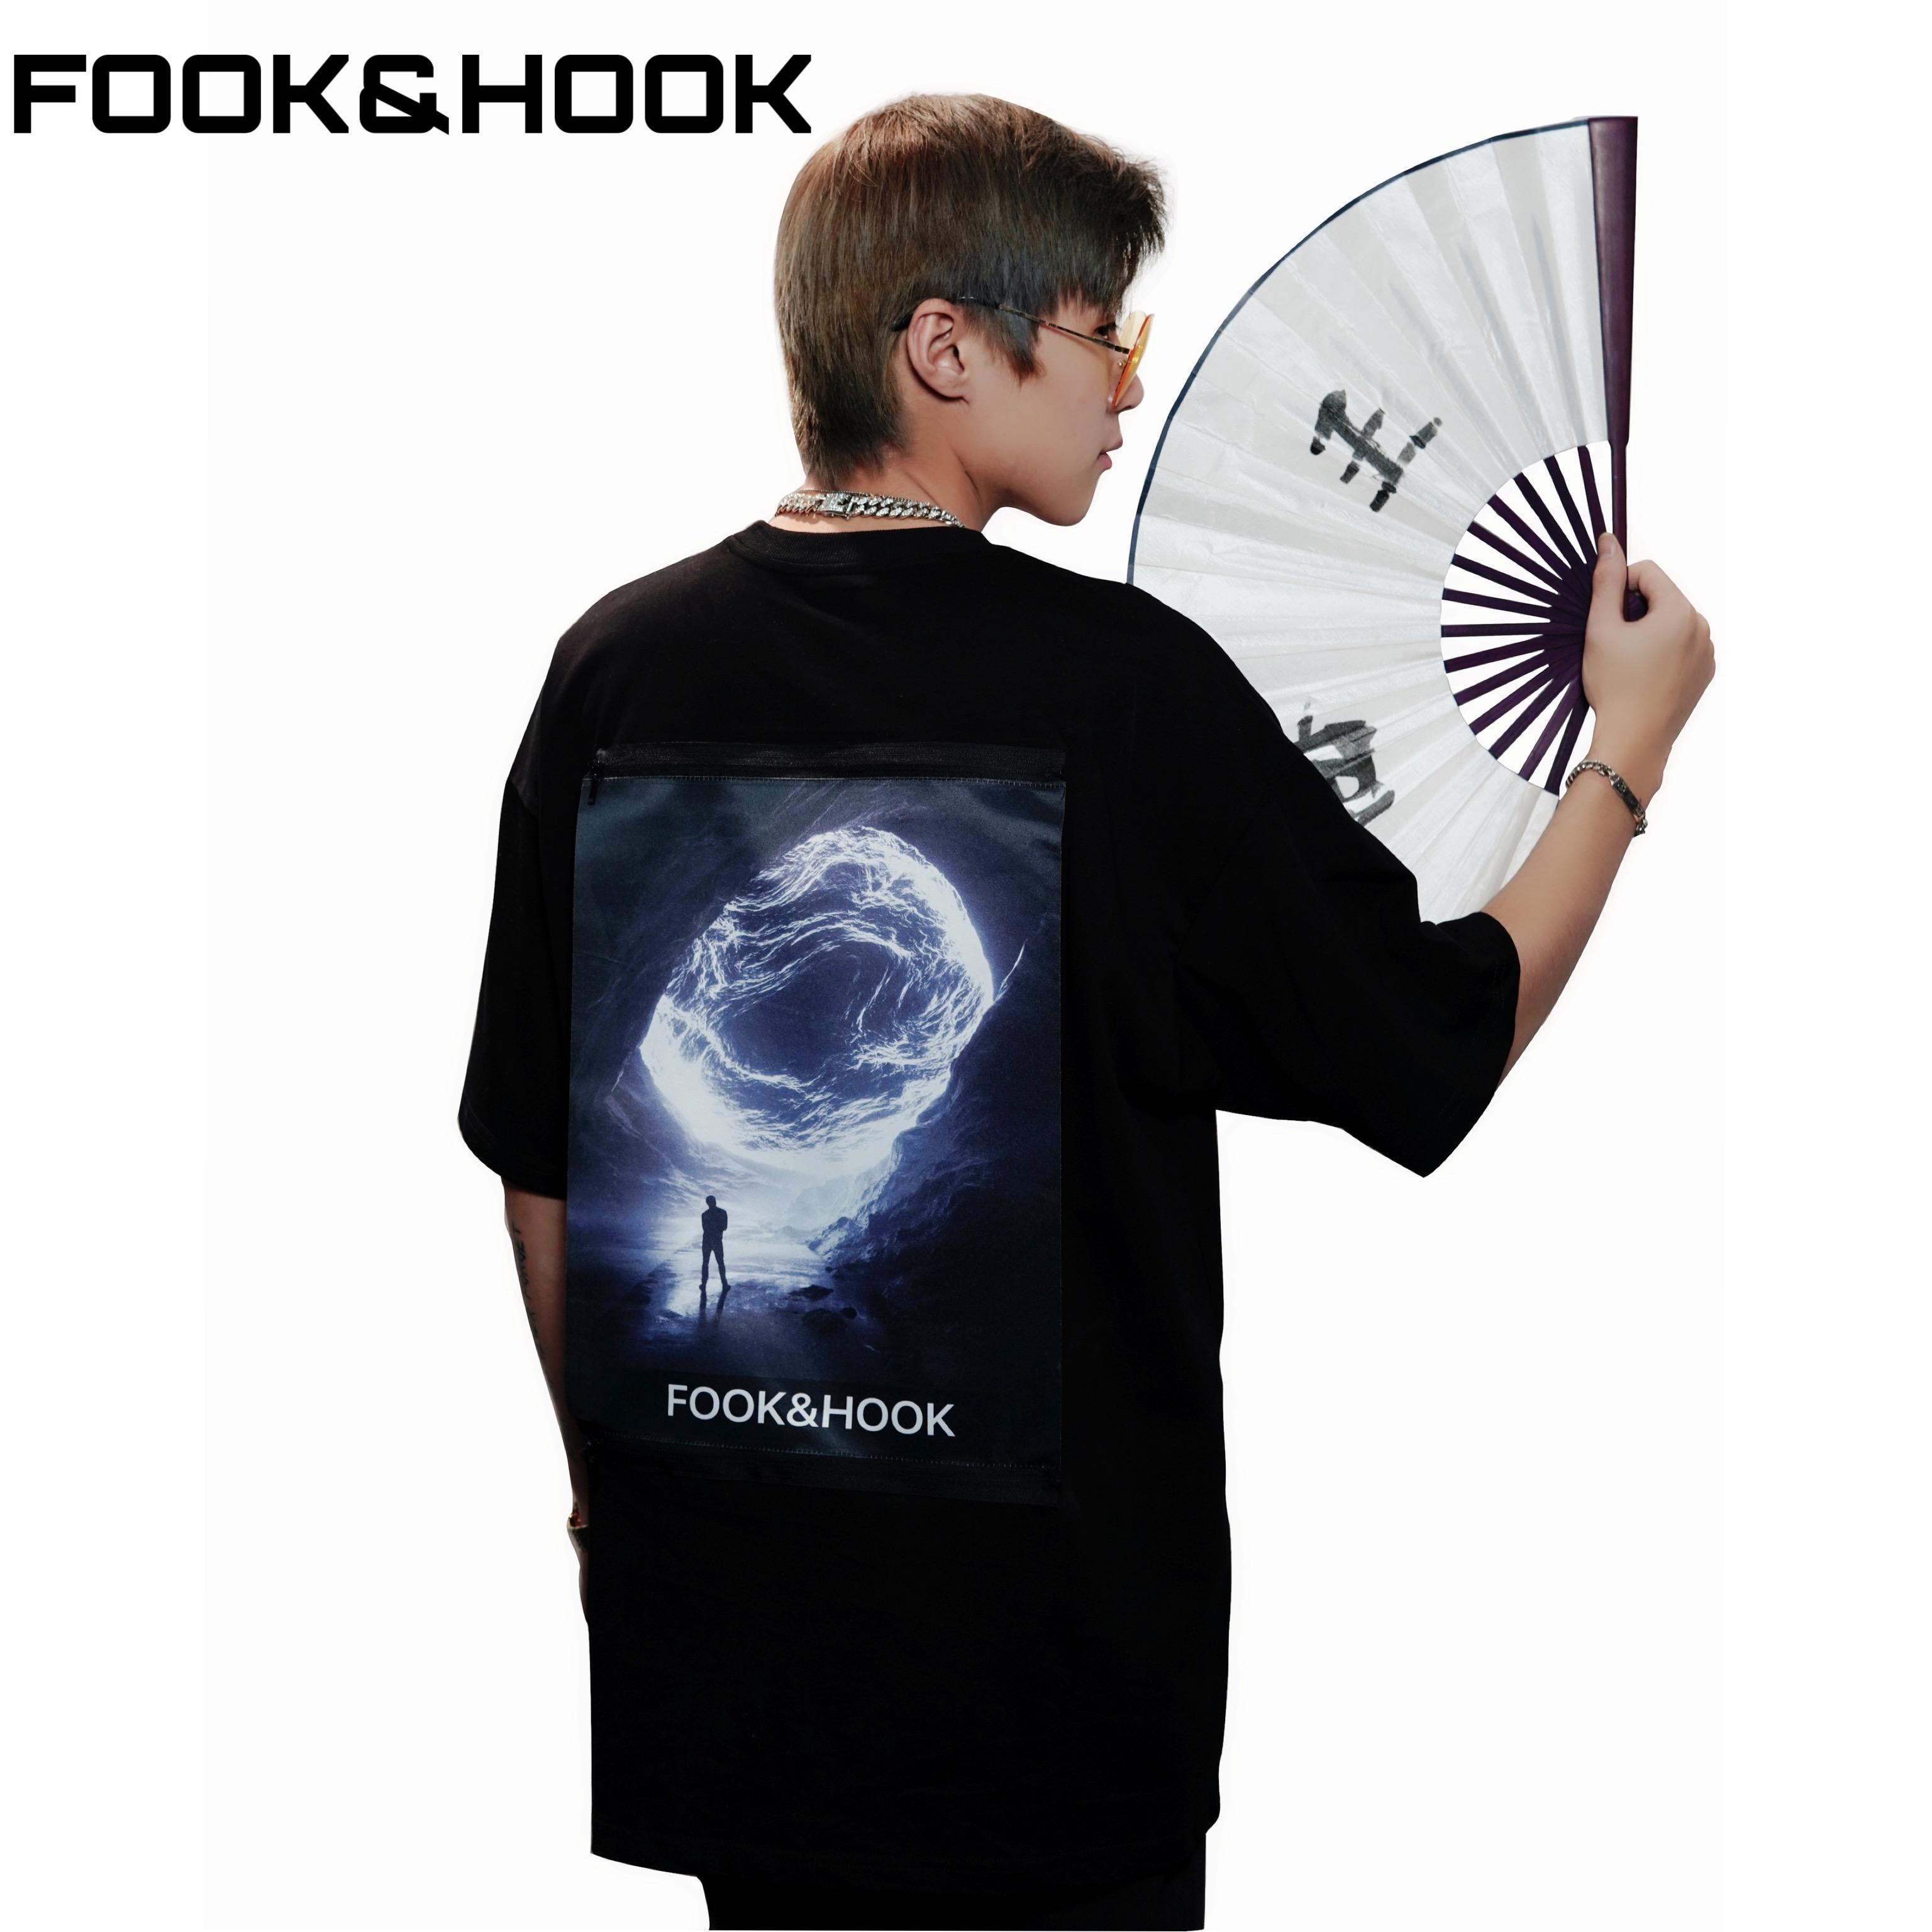 【FH】FOOK&HOOK国朝オリジナルデザイナーブランドは春夏男女Tシャツの半袖カップルを自由に交換します。